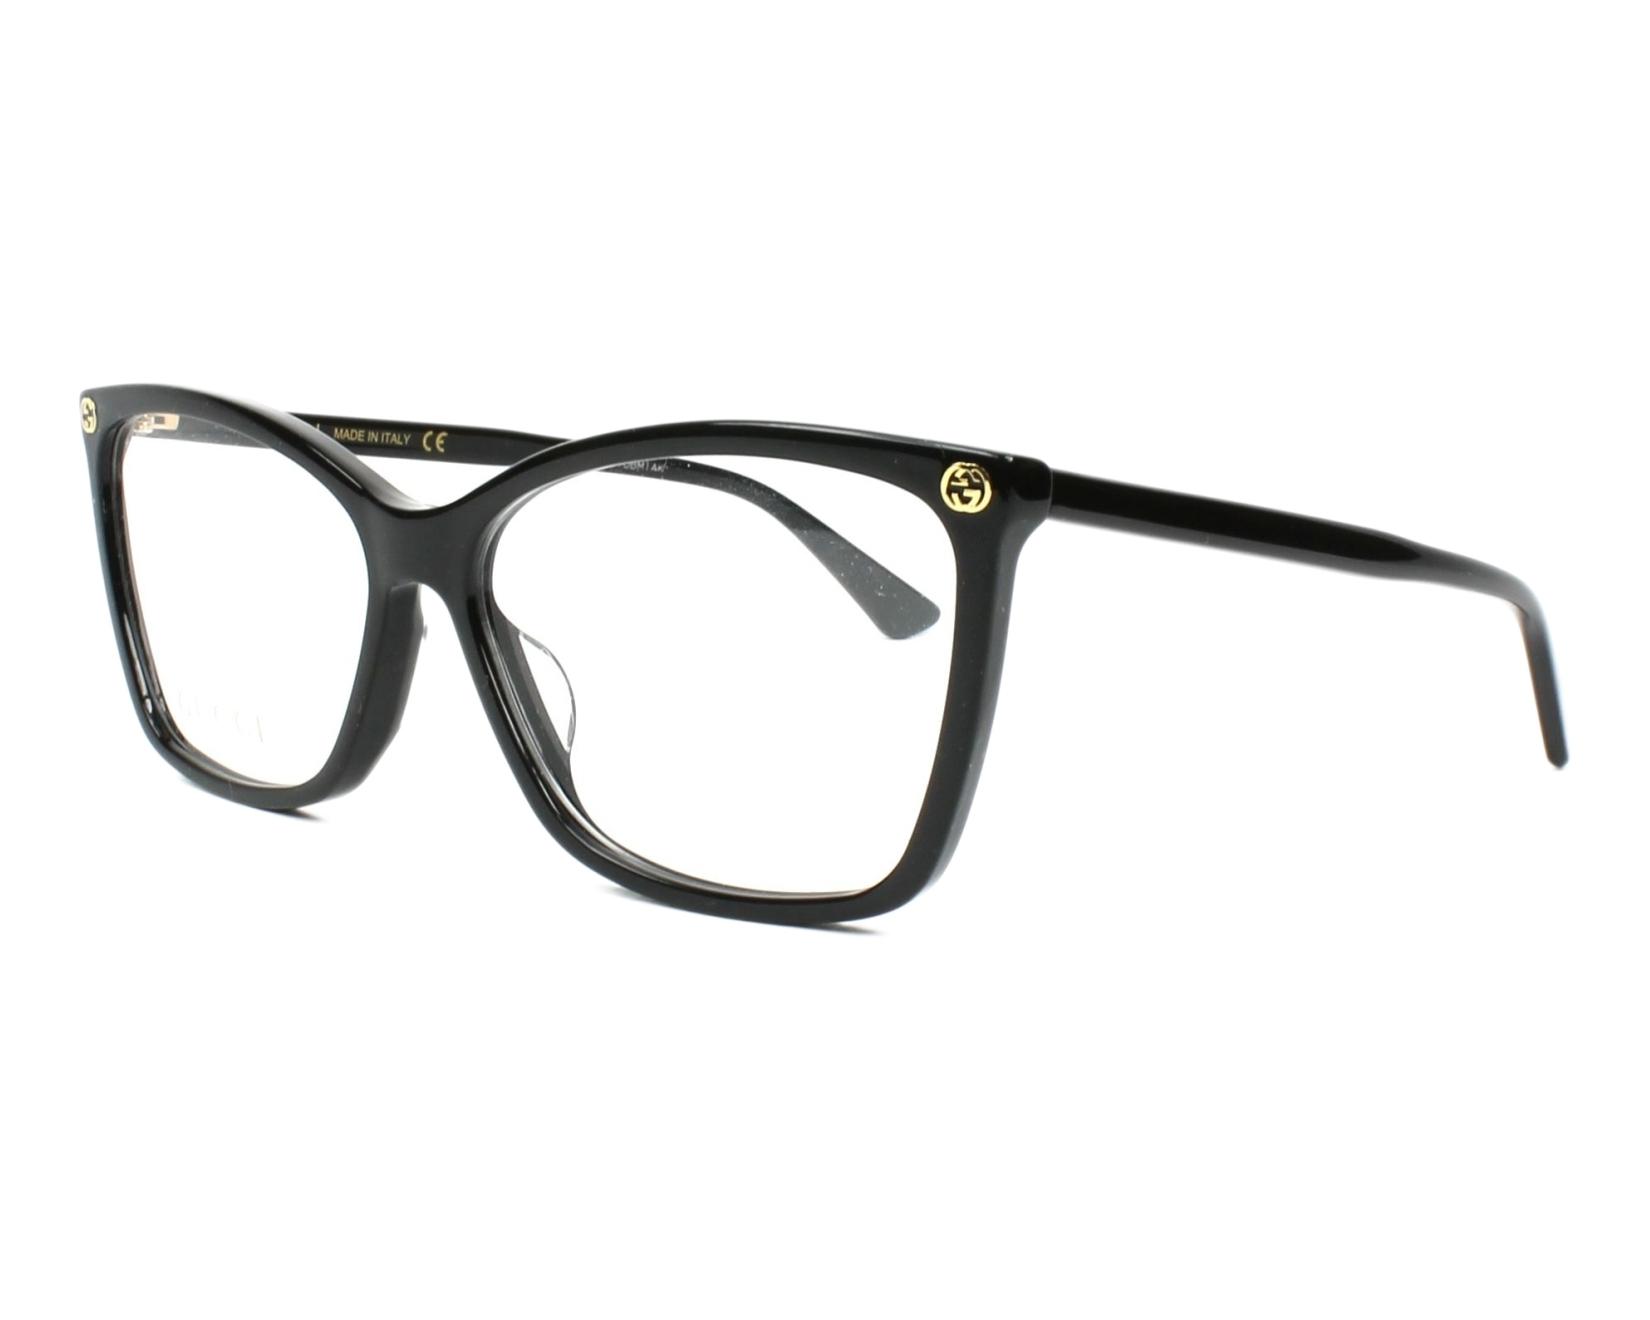 bedddeff44f eyeglasses Gucci GG-00250 001 56-14 Black profile view